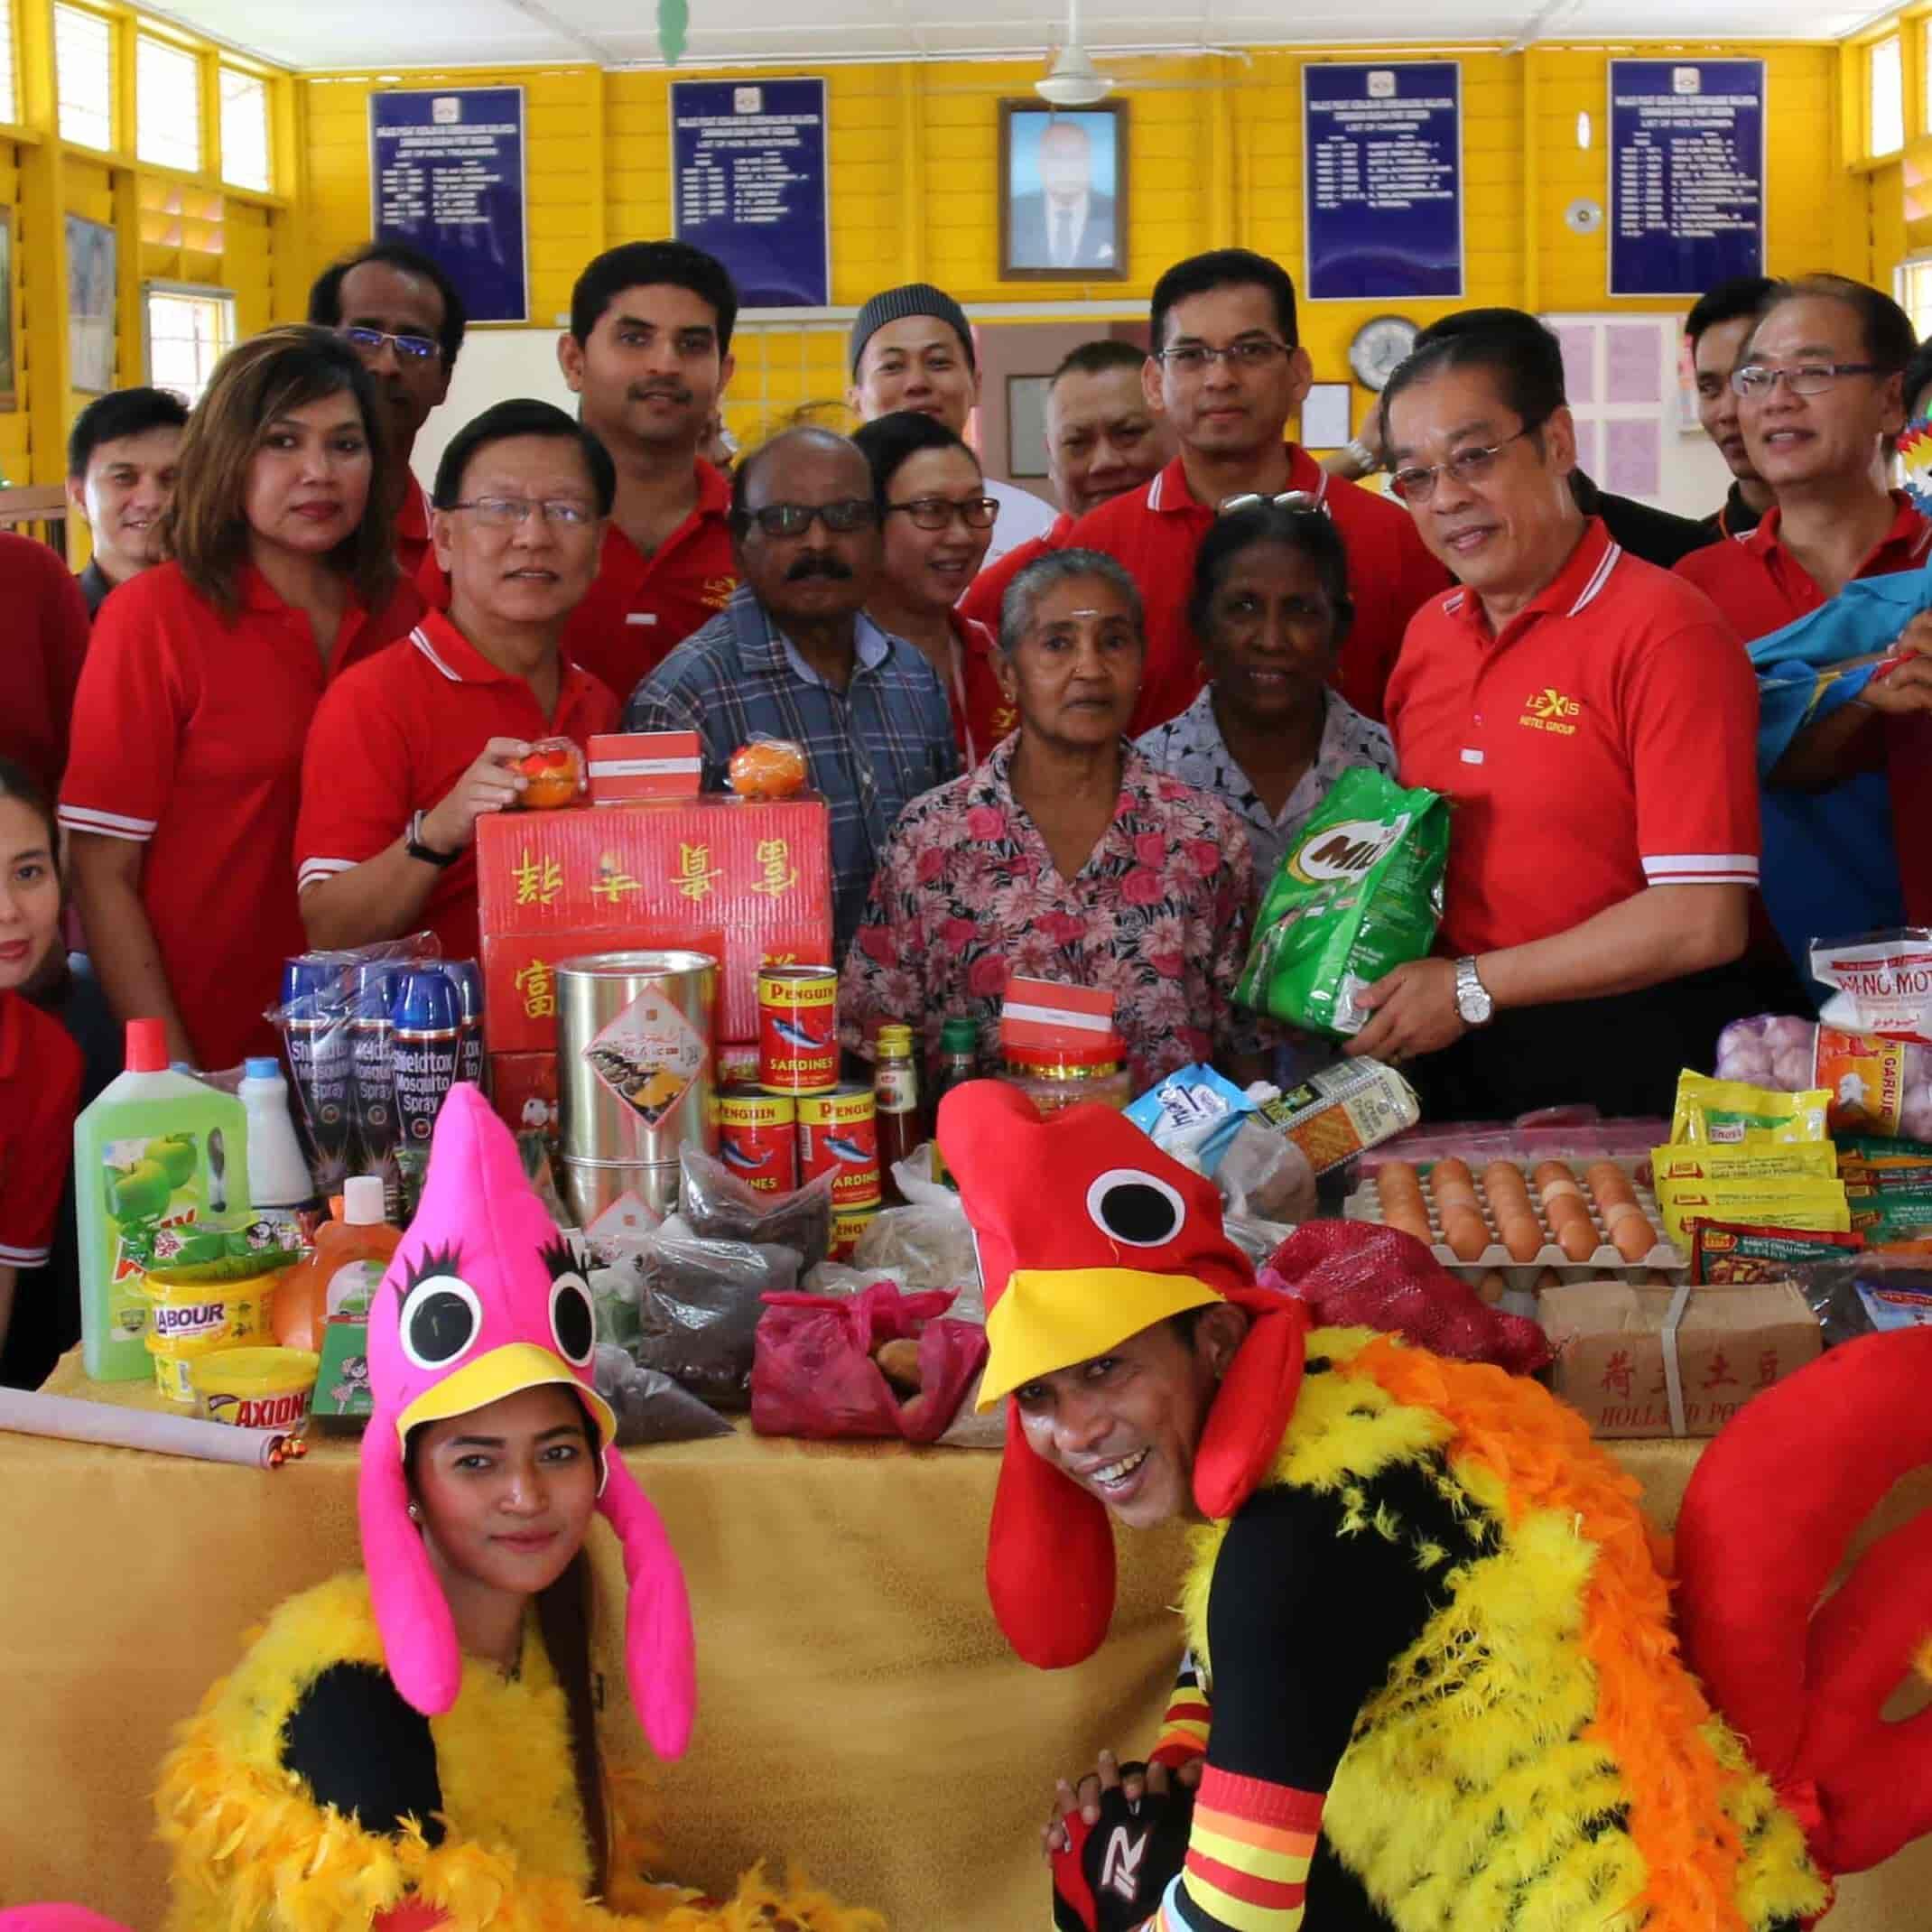 News 2017 - Old Folks Home CNY Feast | Lexis® Hotel Group